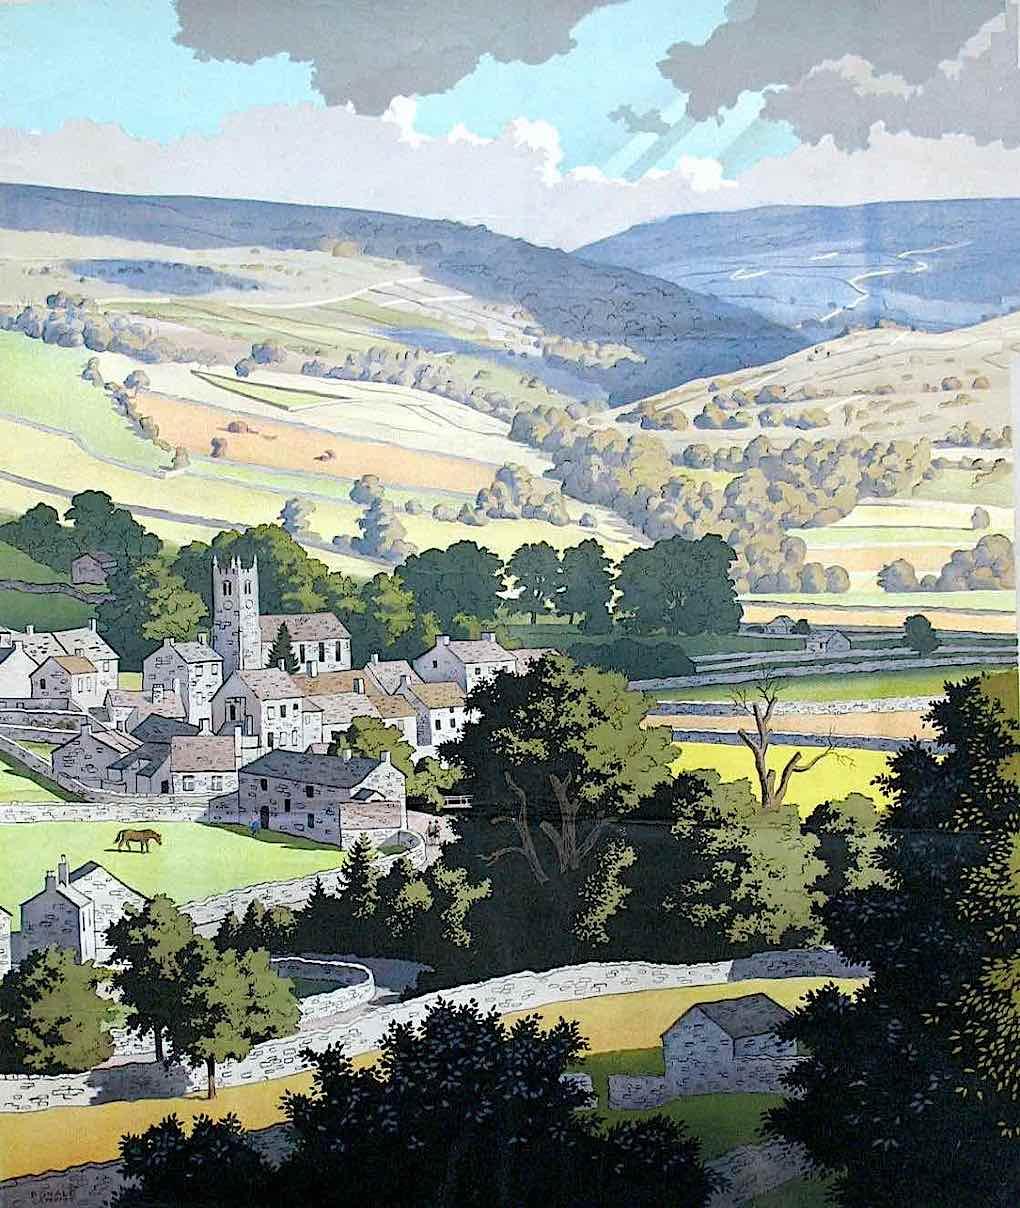 a Ronald Lampitt English country landscape illustration